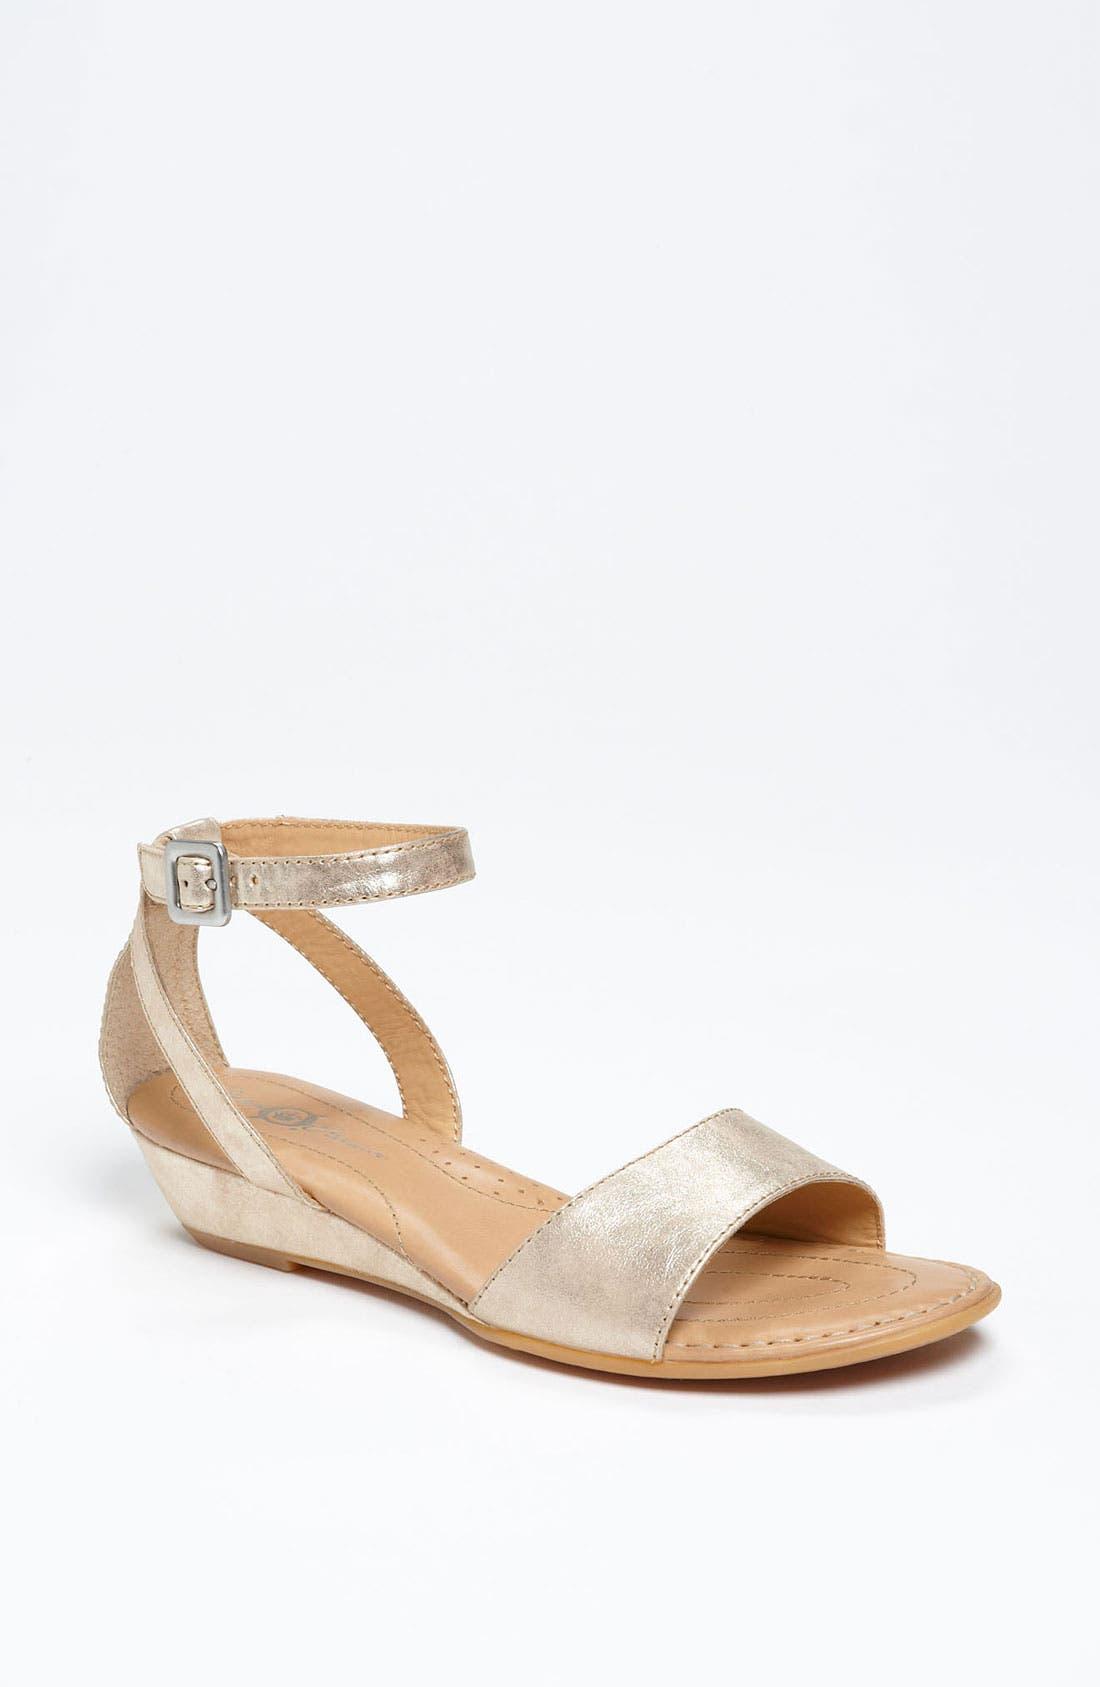 Main Image - Børn Crown 'Landis' Sandal